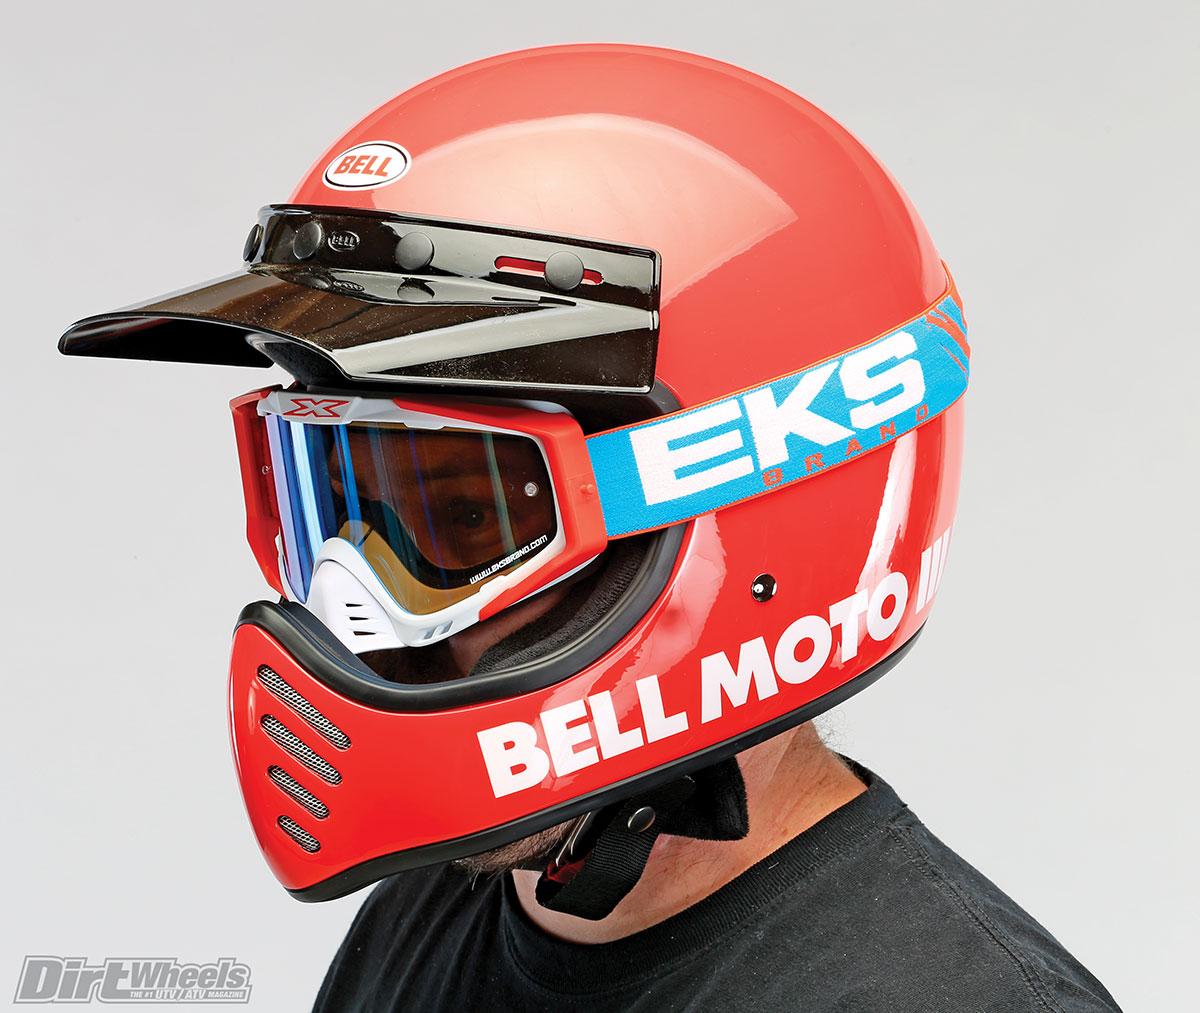 Bell Moto 3 >> Product Evaluation Bell Moto 3 Helmet Dirt Wheels Magazine